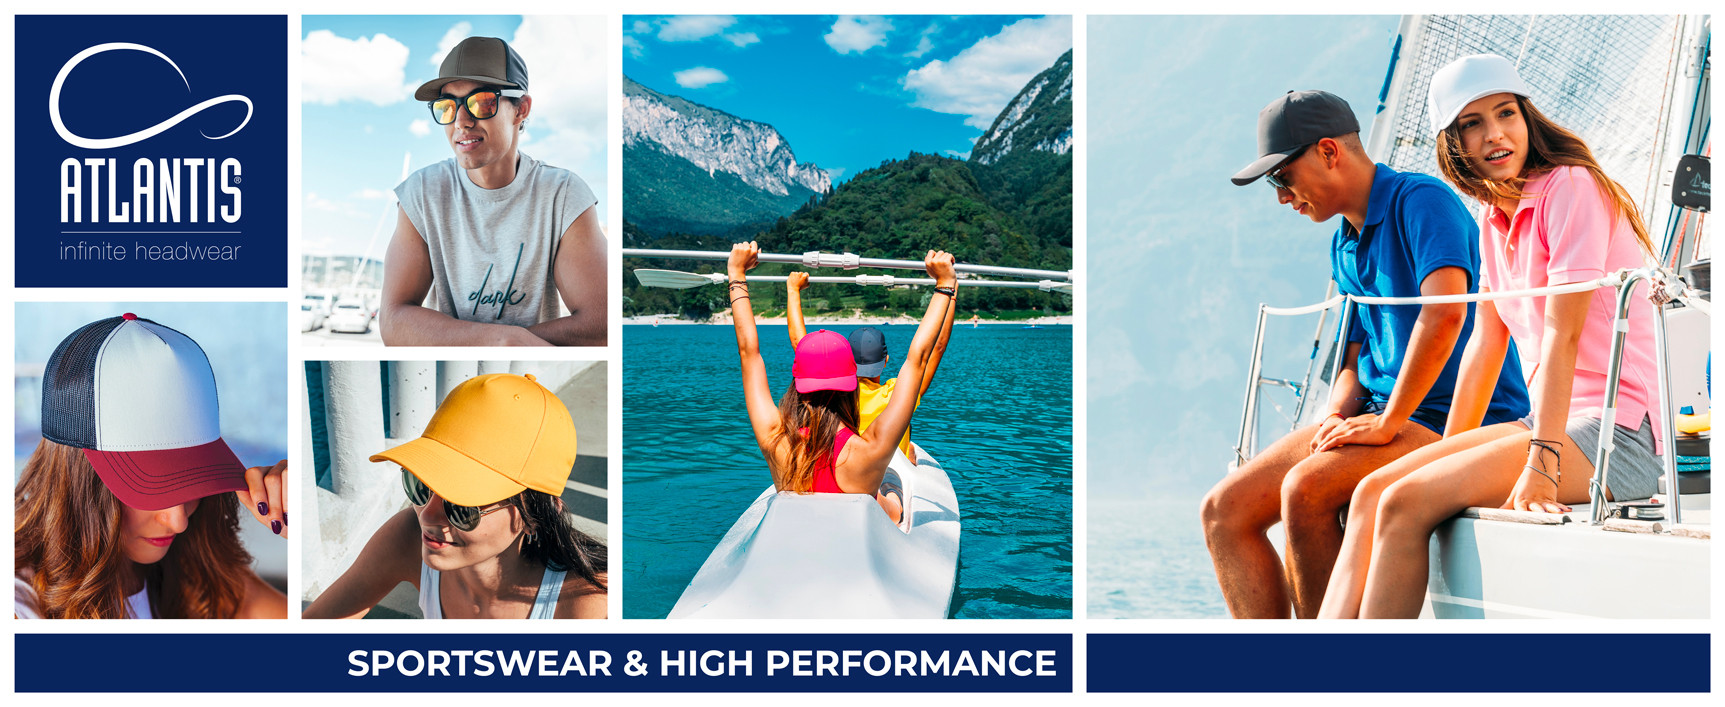 Sportswear & High performance by Atlantis